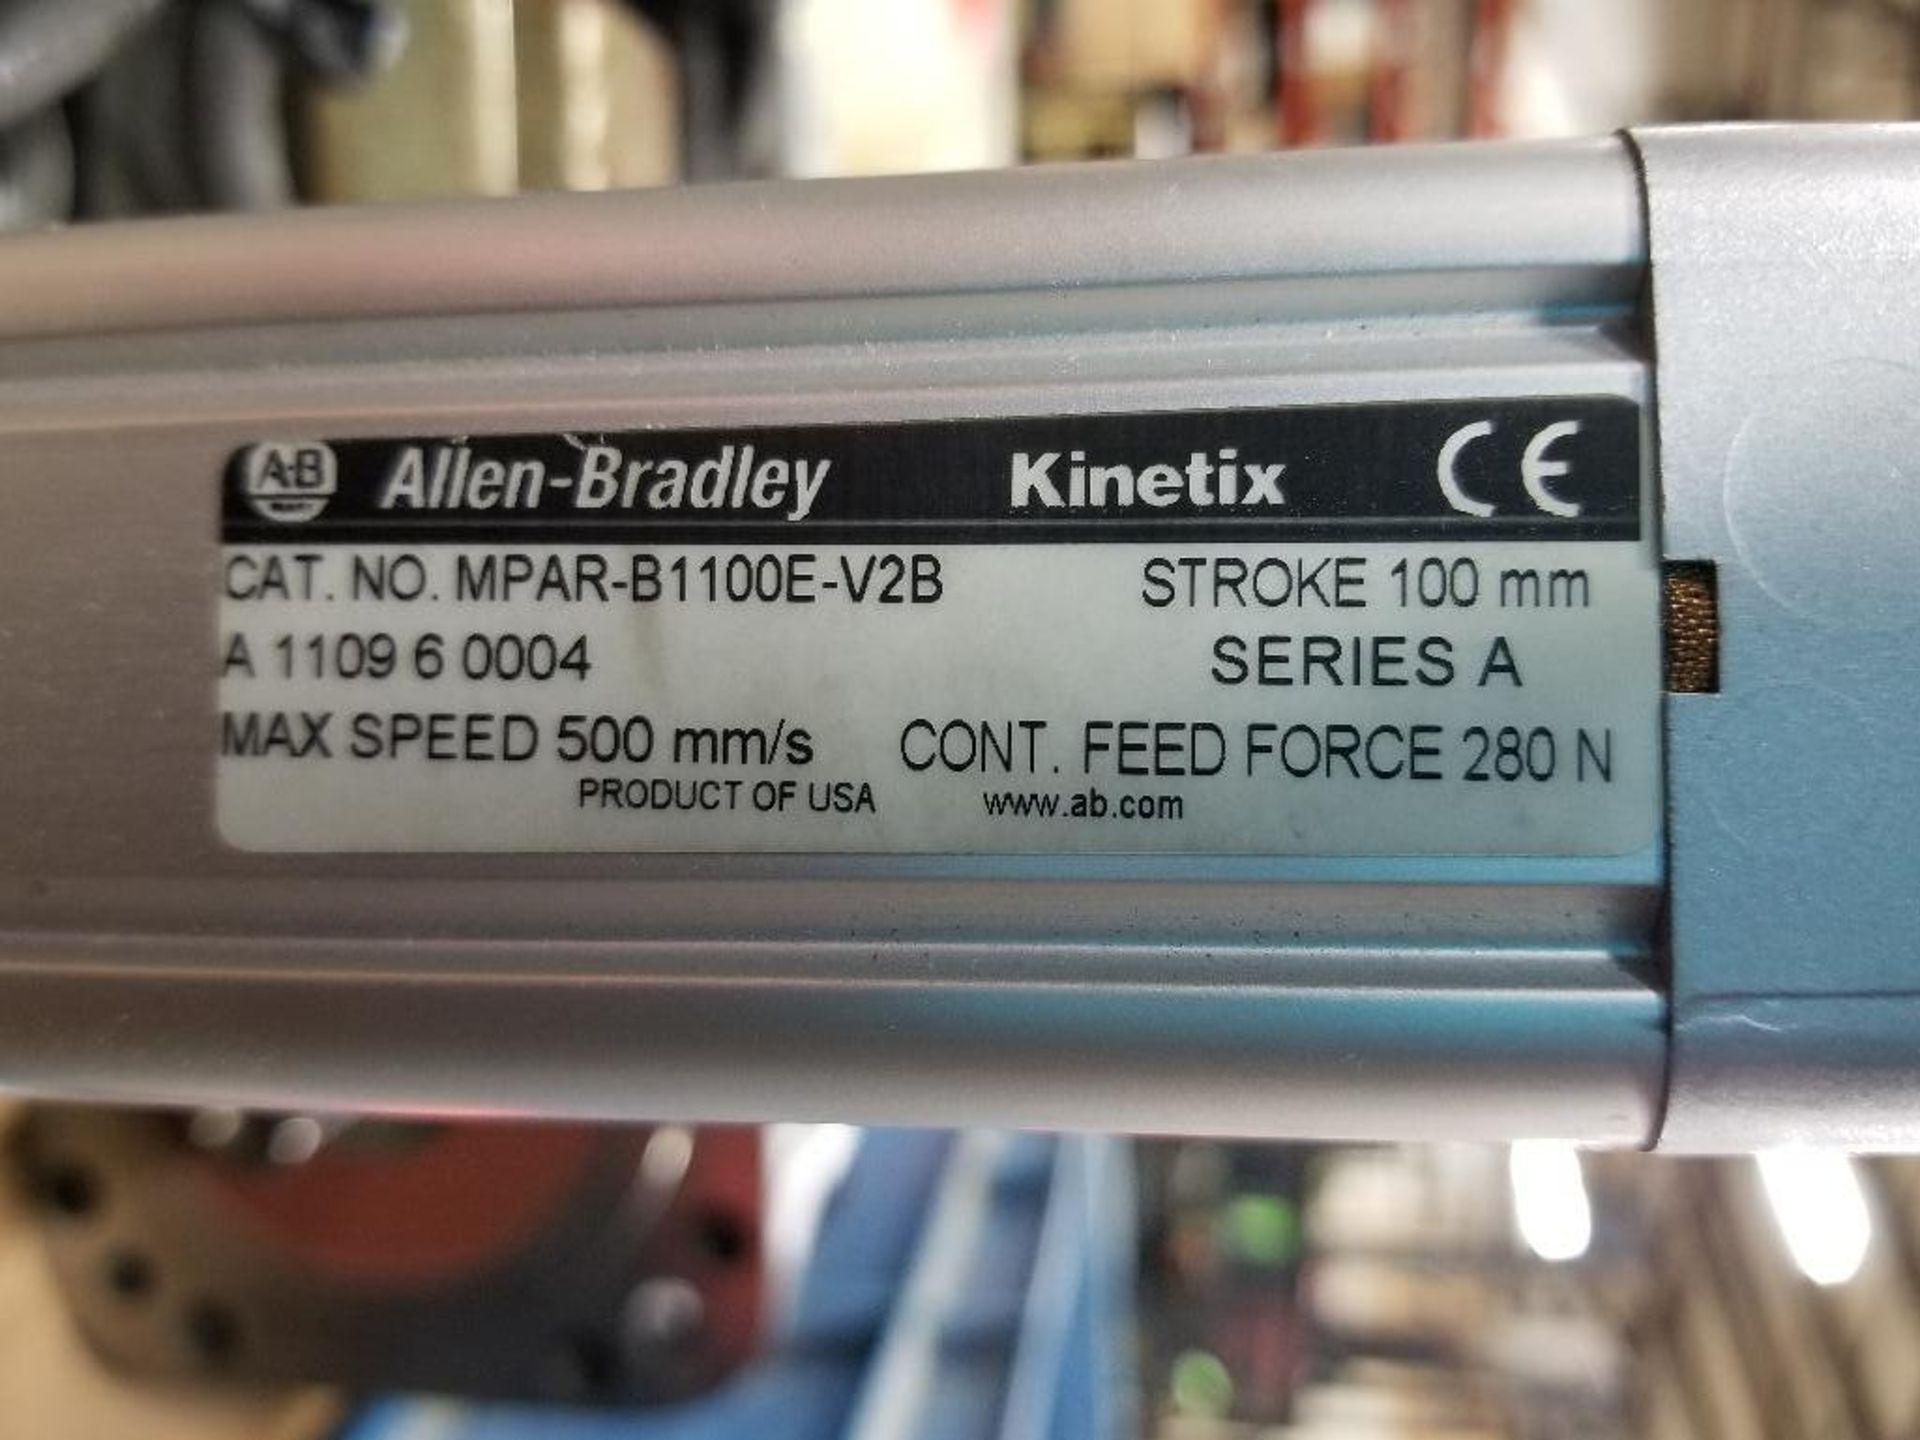 Allen Bradley Kinetix MPAR-B1100E-V2B. 100mm- Stroke, 500mm/speed. - Image 3 of 3